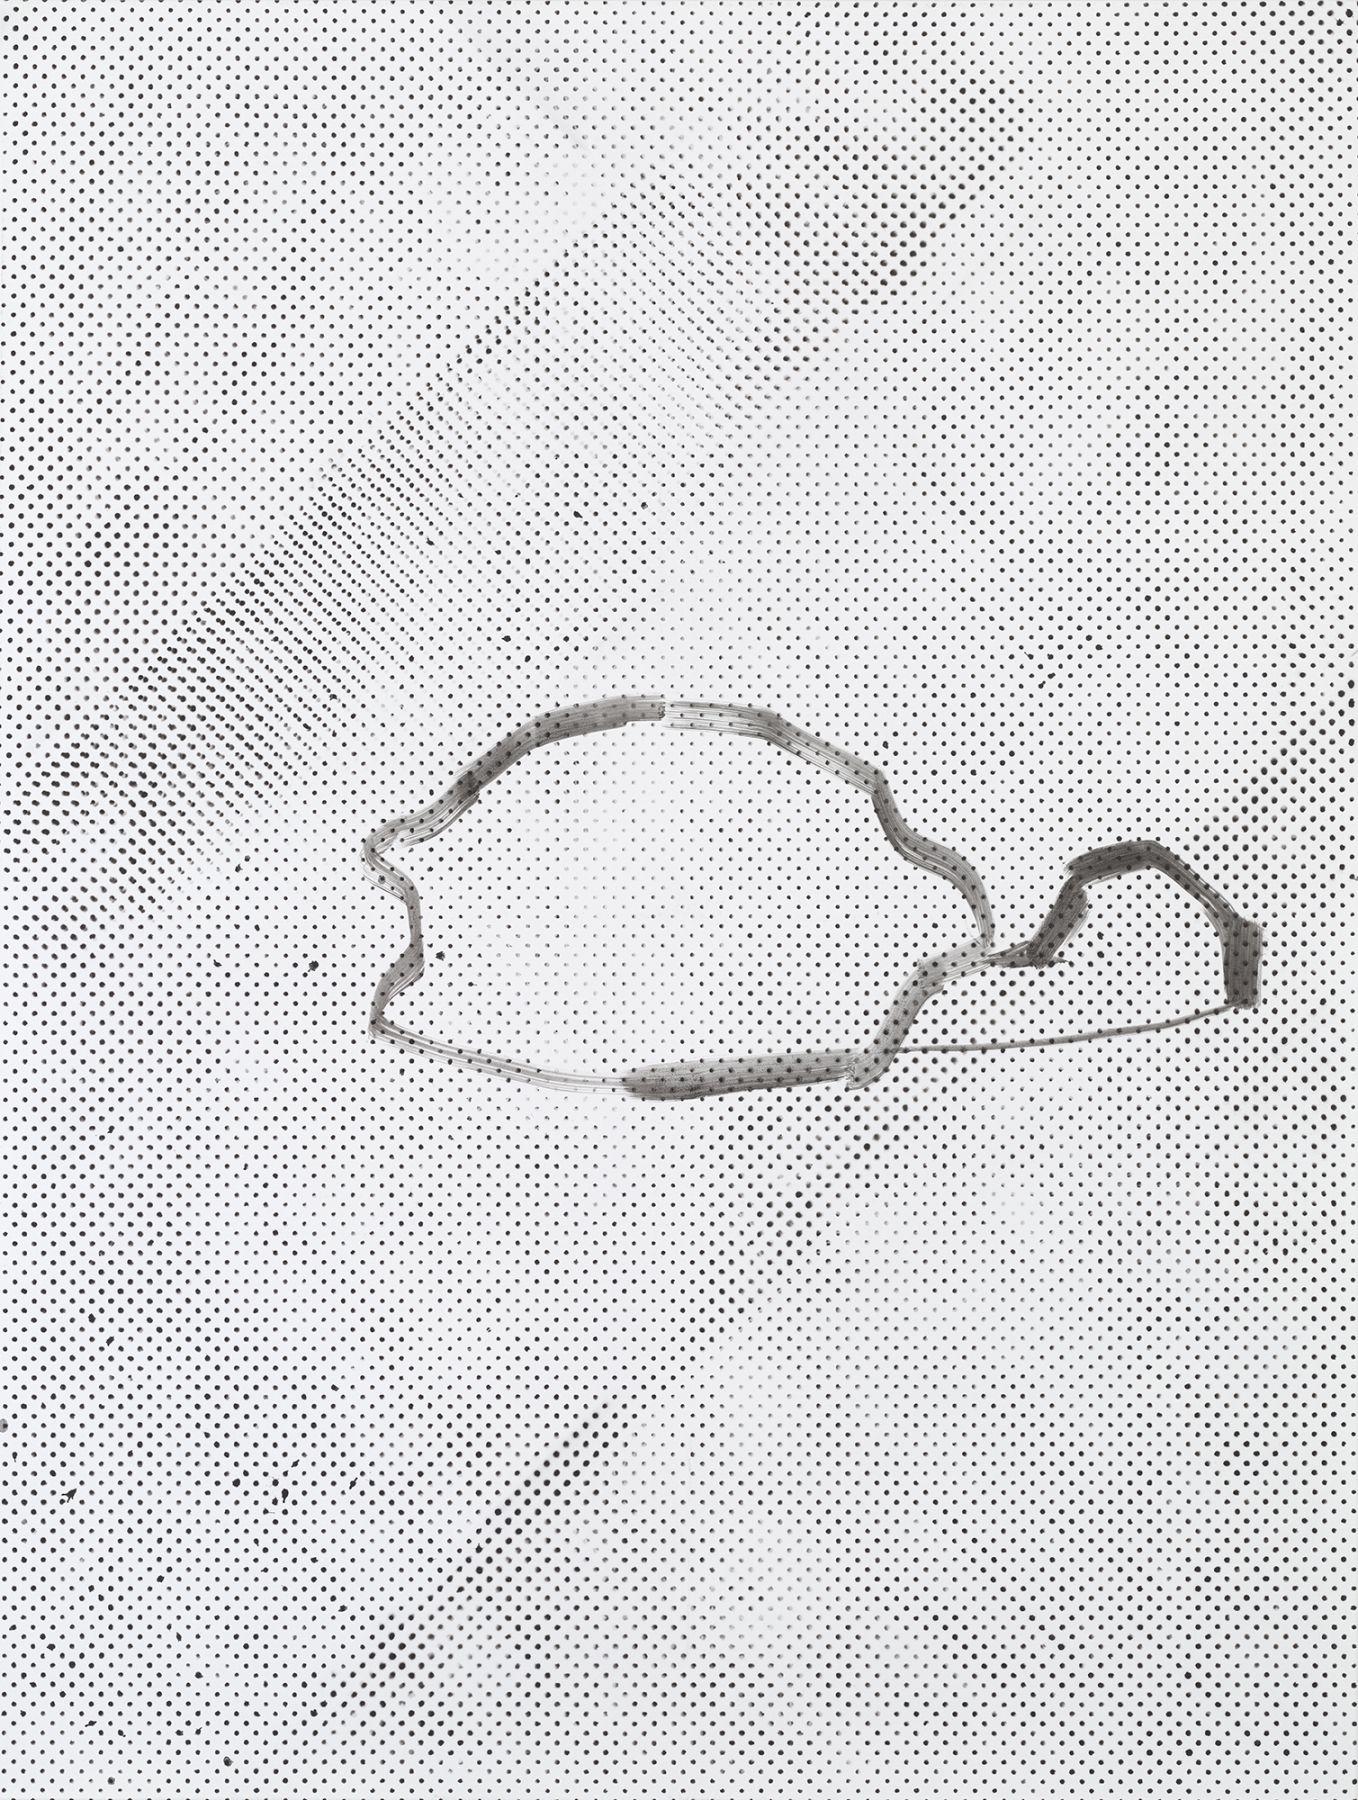 Michael Krebber MK.286, 2015 Lacquer on canvas  78 3/4 x 59 1/8 inches (200 x 150.2 cm)